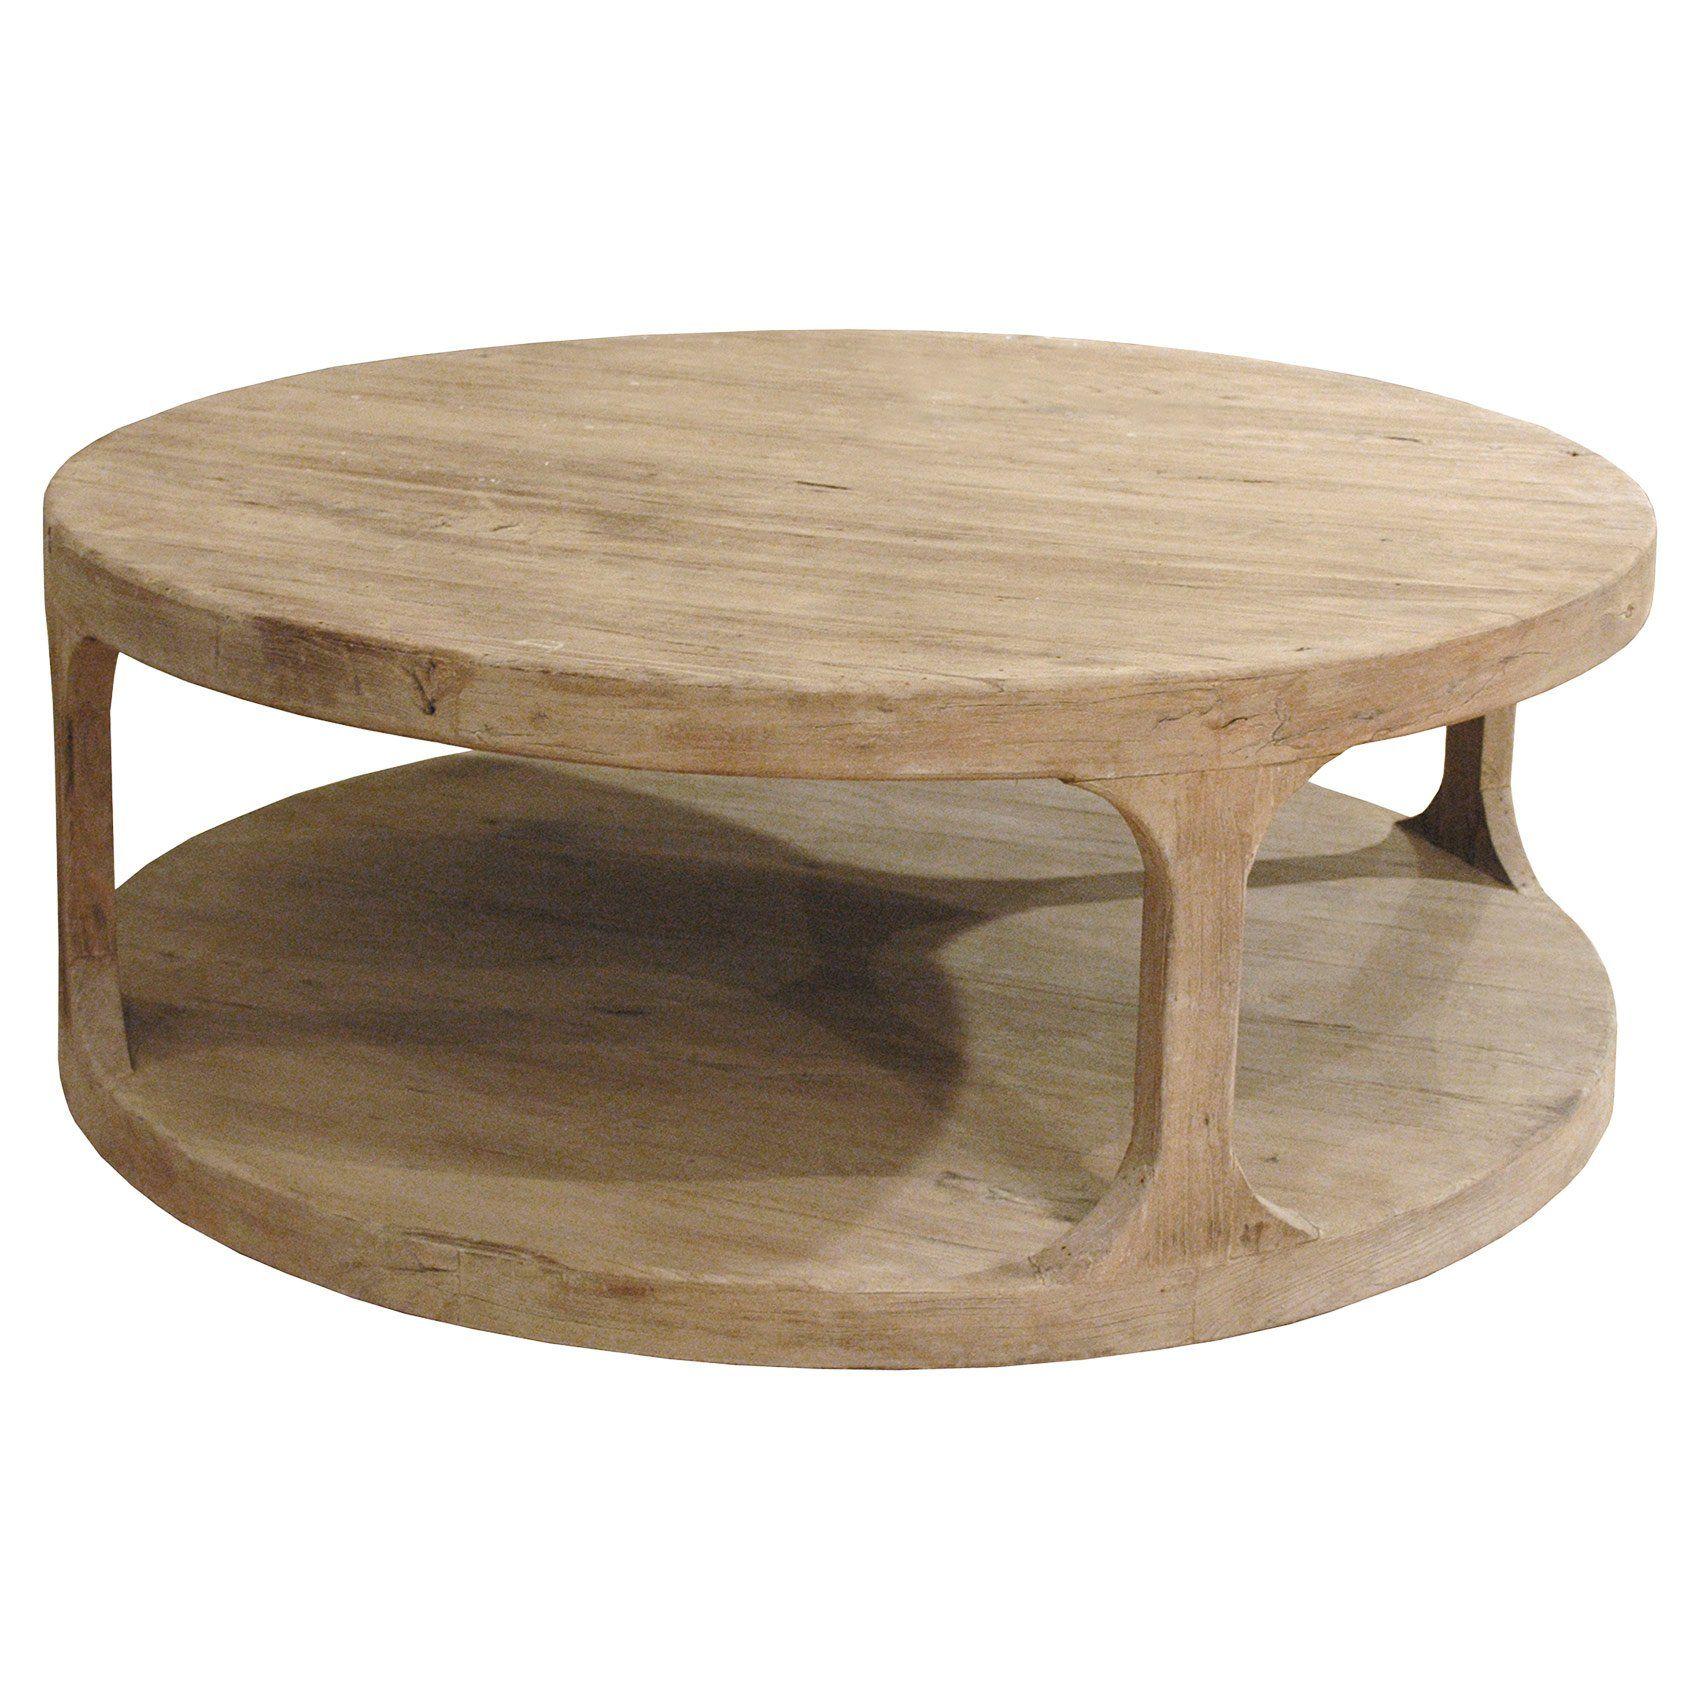 Sian Rustic Lodge Brown Pine Wood Round Coffee Table